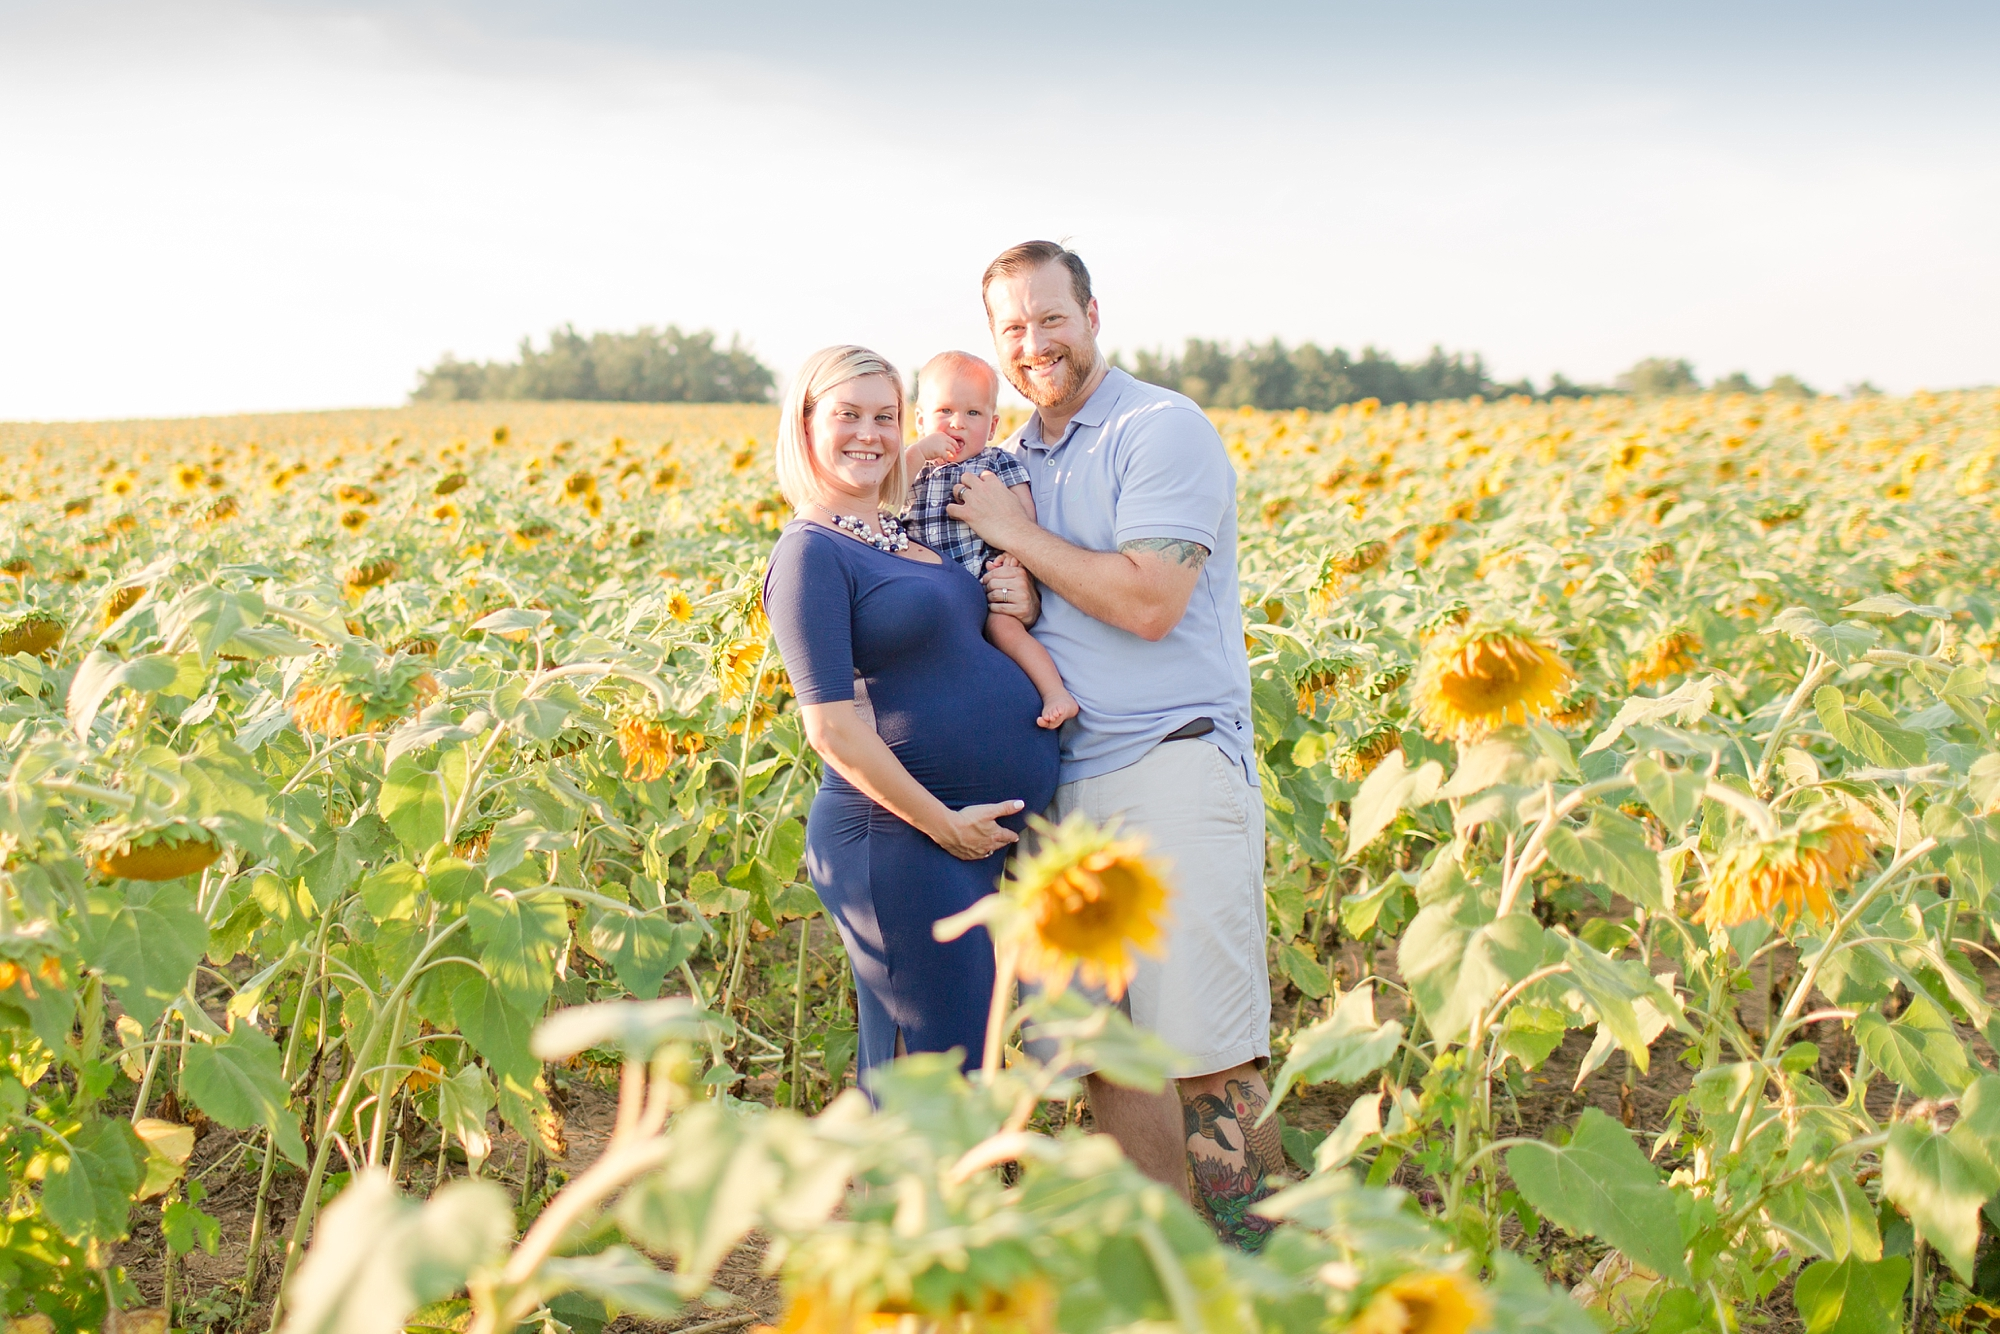 Andrews Family 2016-142_anna grace photography baltimore maryland maternity family photographer sunflower field photo.jpg